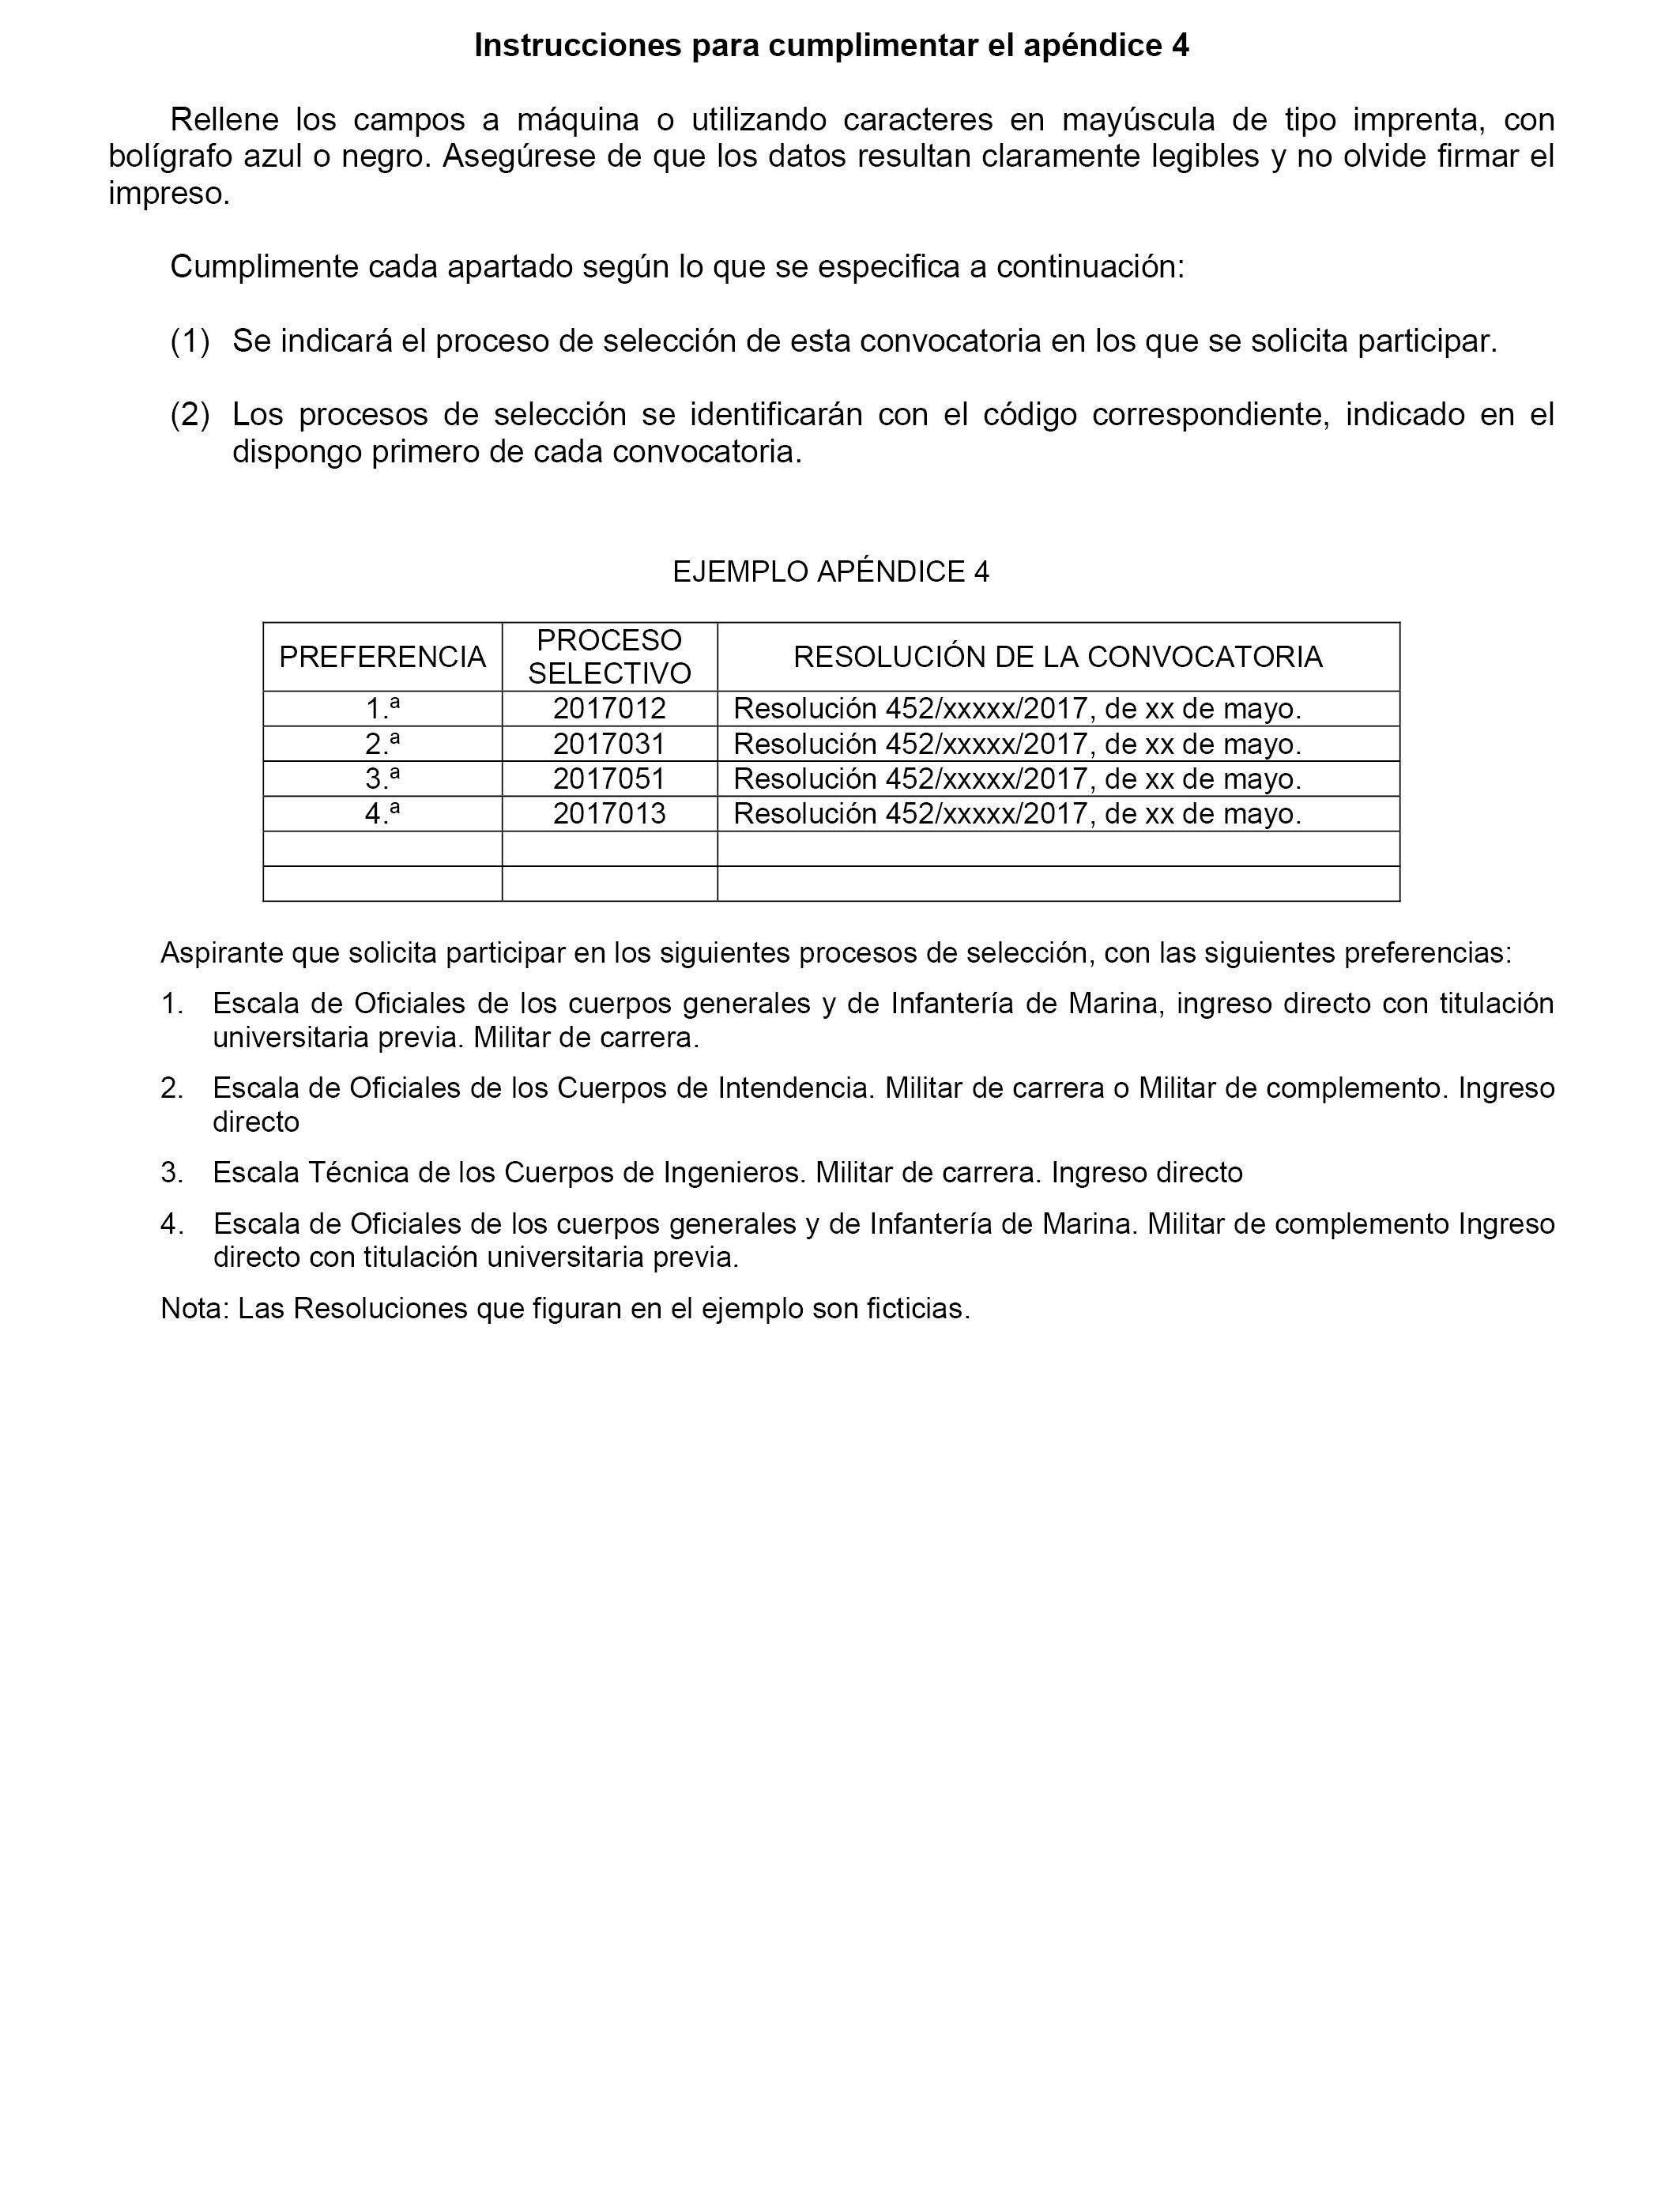 BOE.es - Documento BOE-A-2017-5915